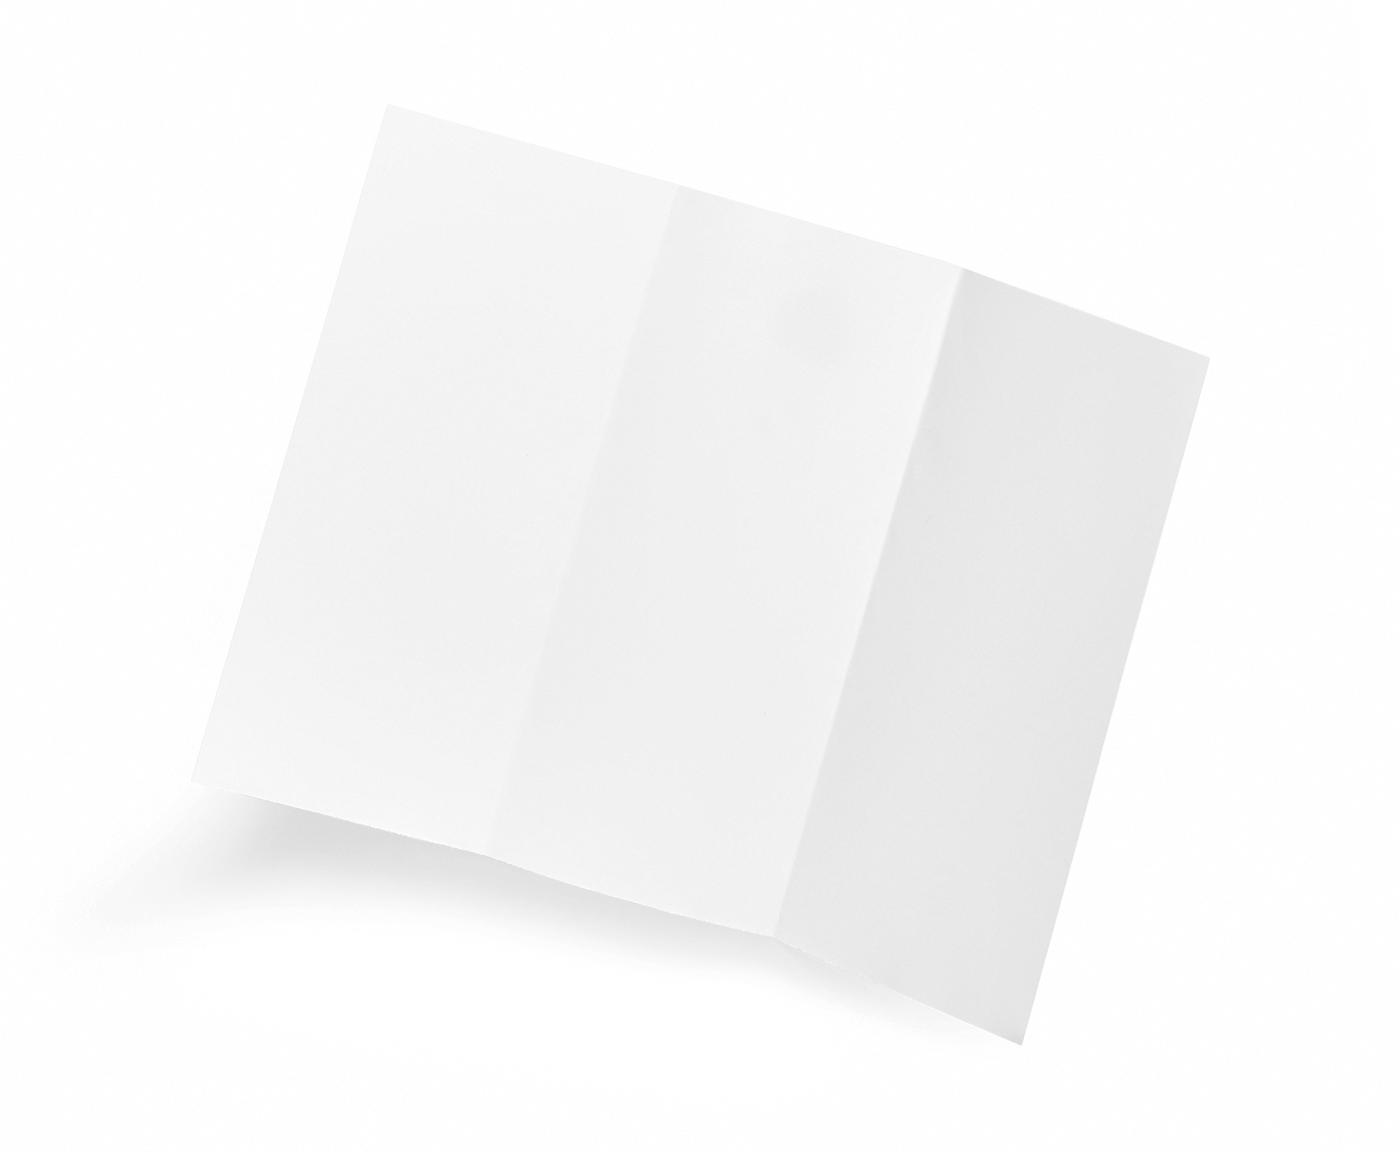 Blanks/USA Tri-Fold Brochure